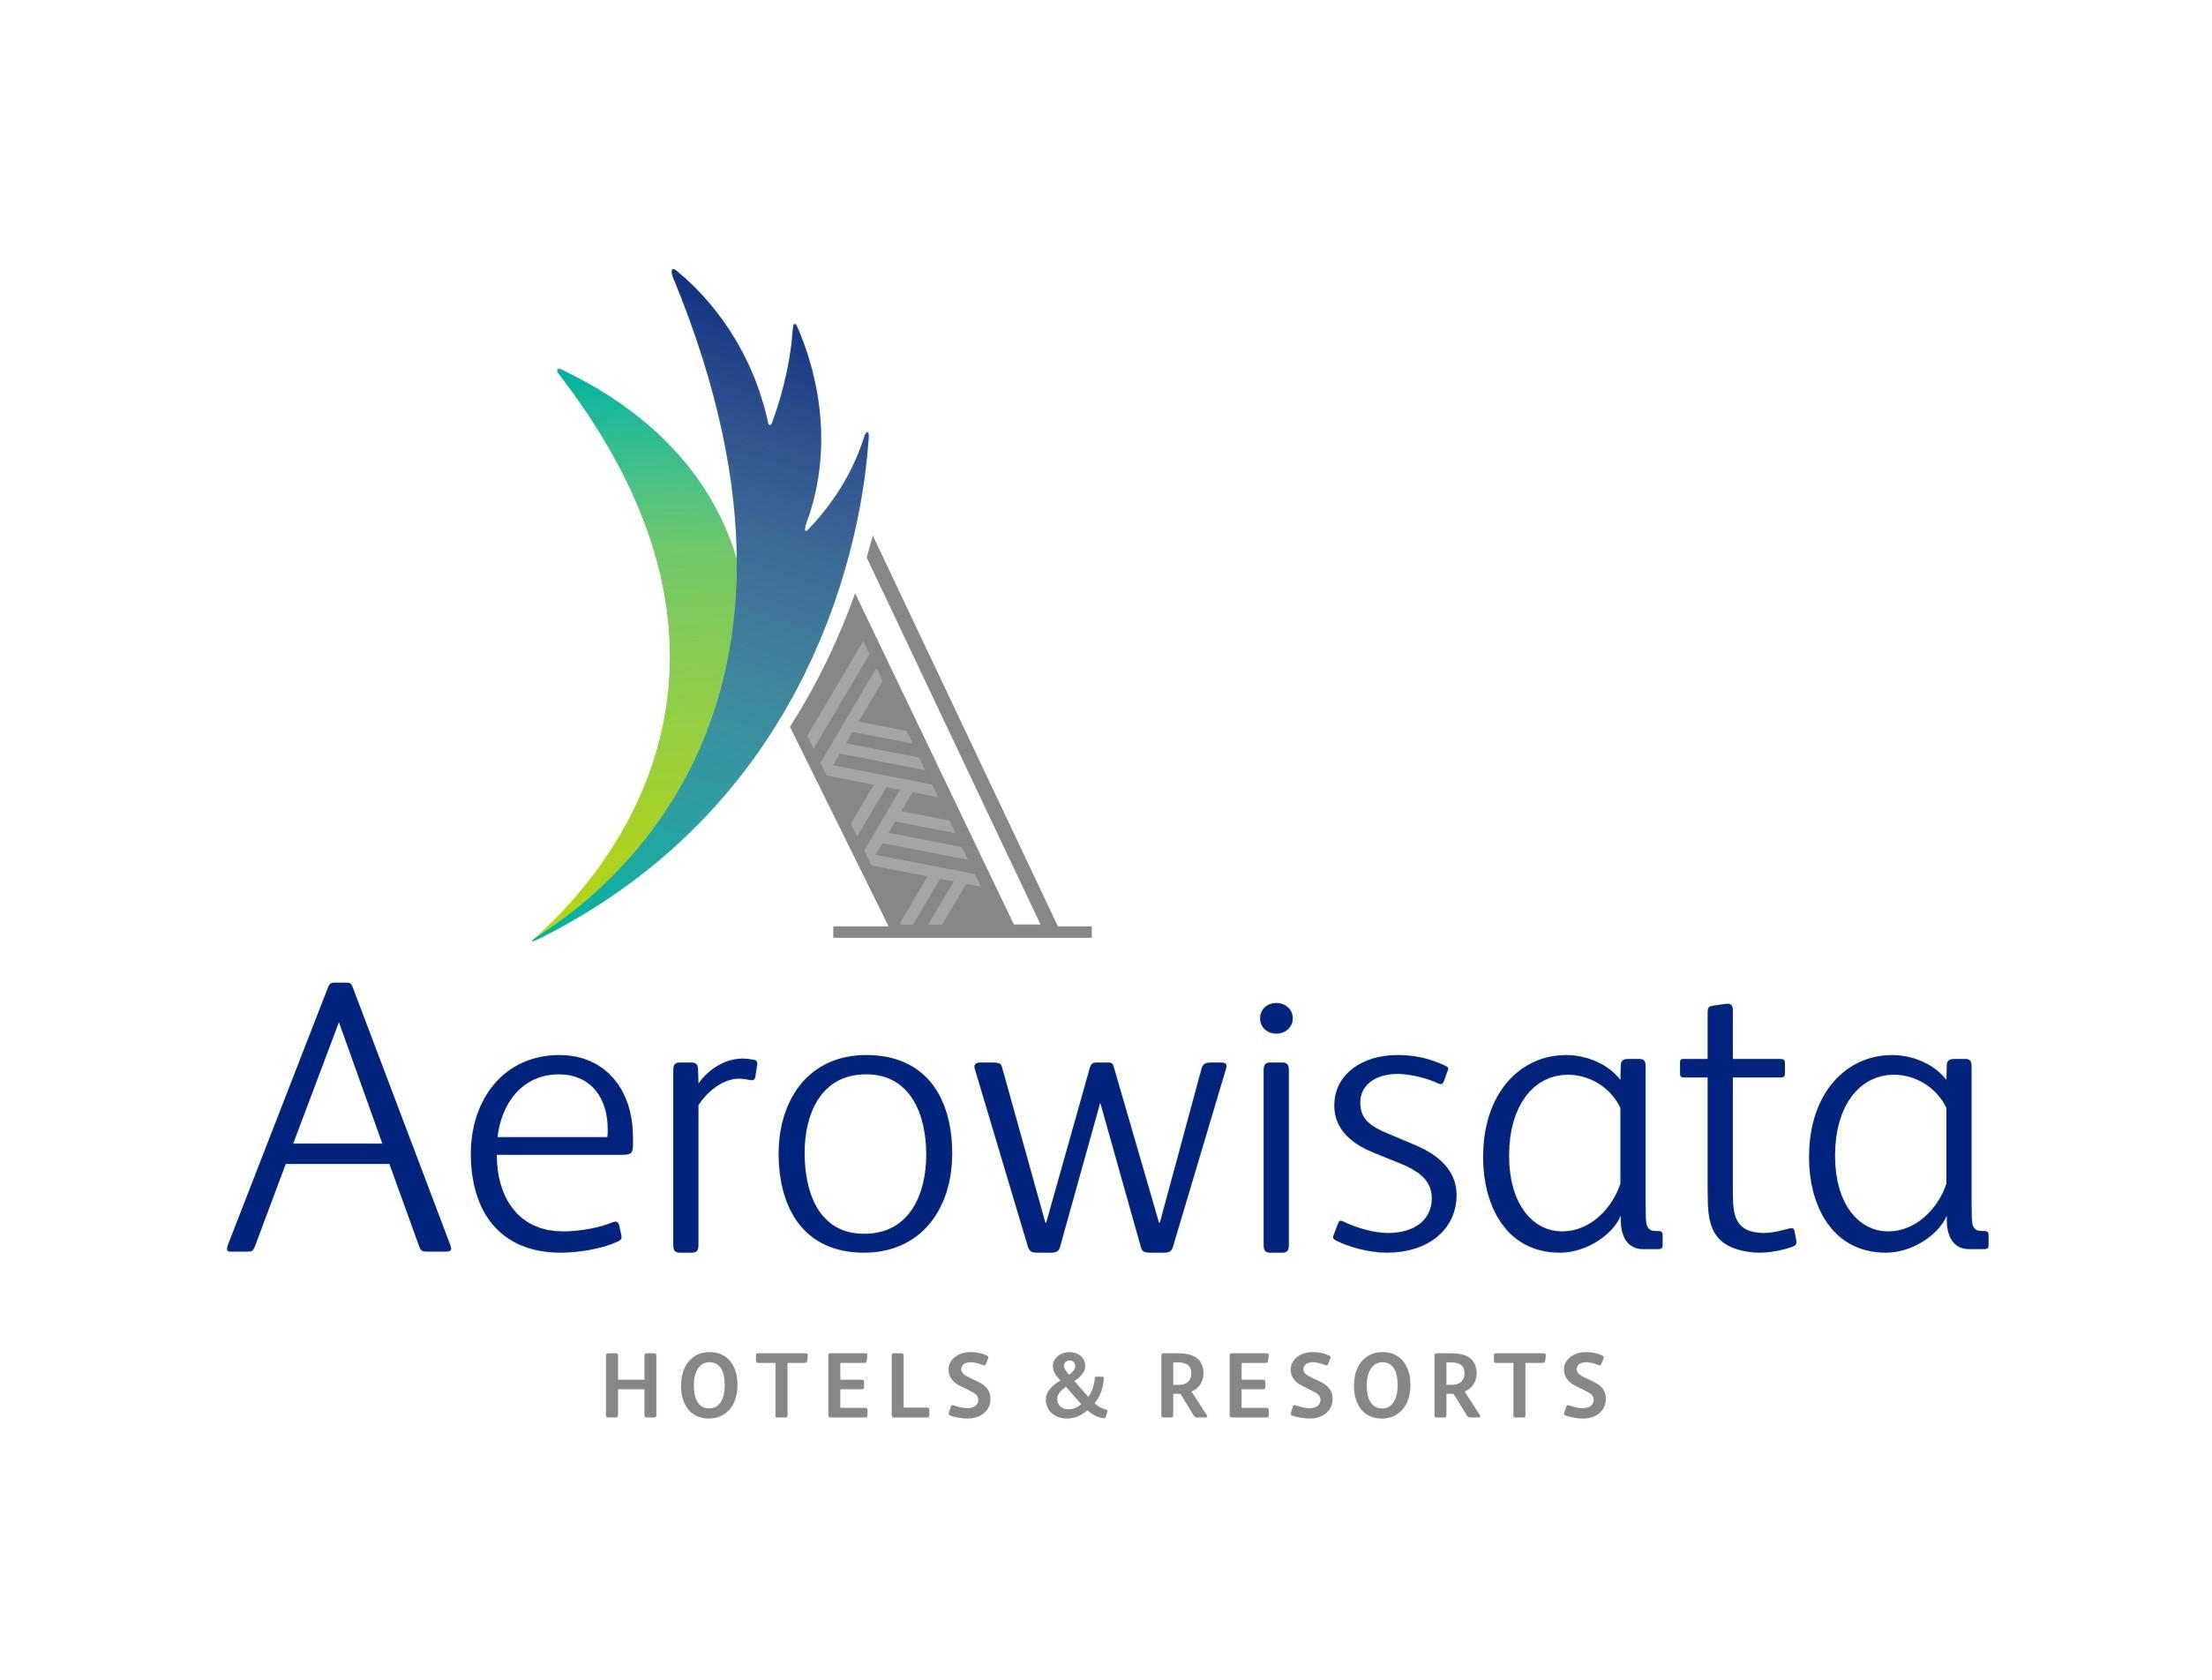 Go to Aerowisata Hotels & Resorts website